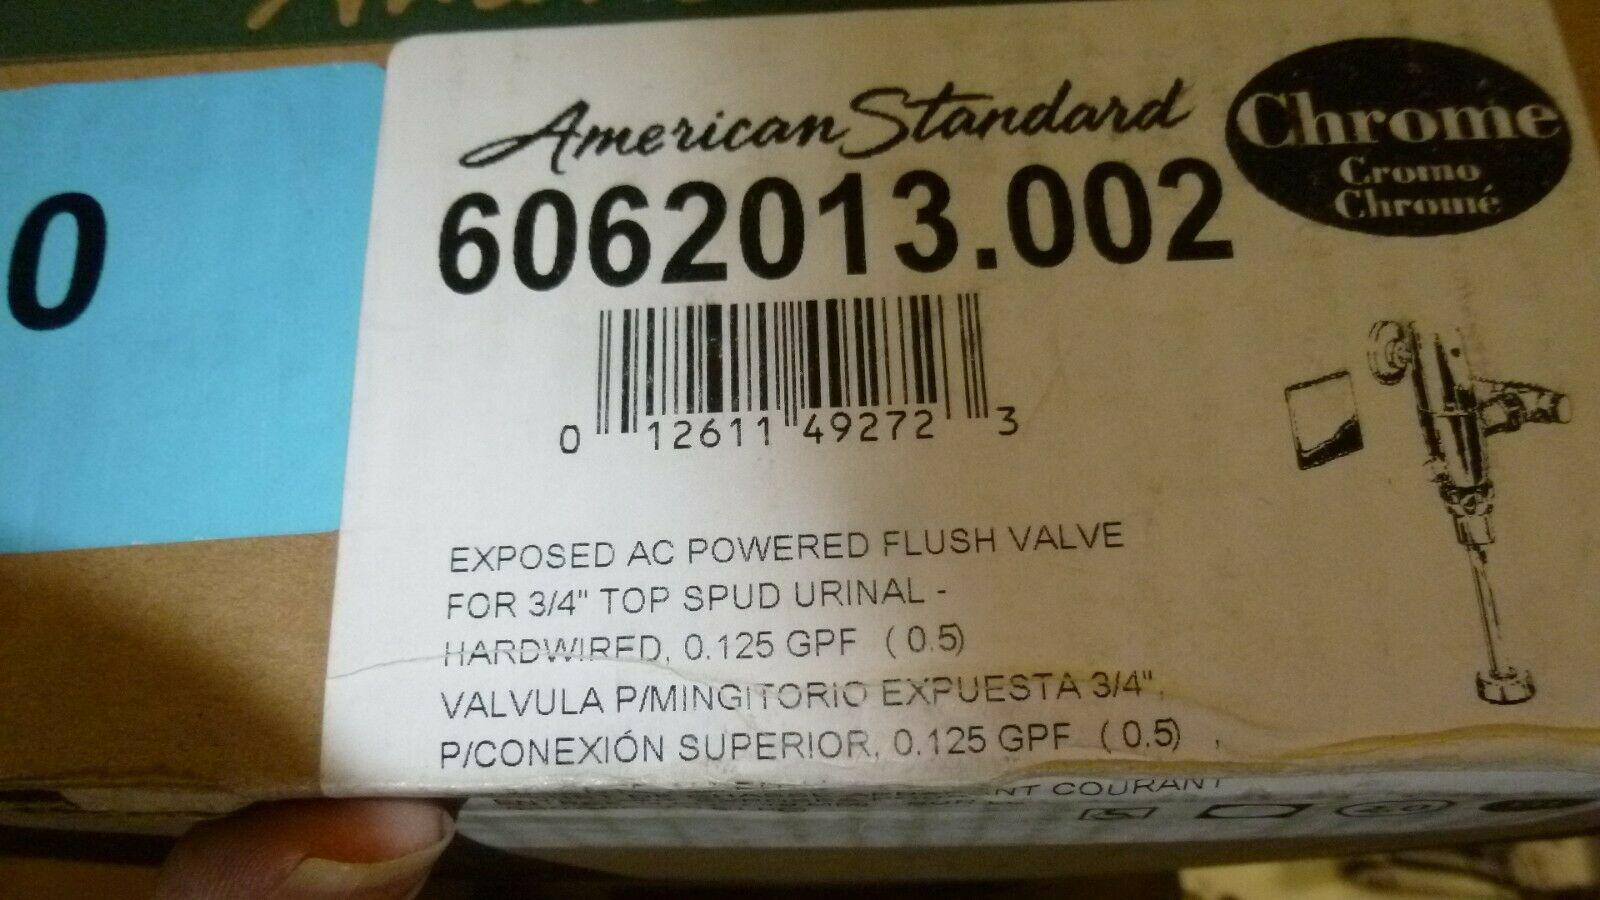 American Standard 6062013.002 Chrome Exposed AC Powered Flush Valve - $145.00